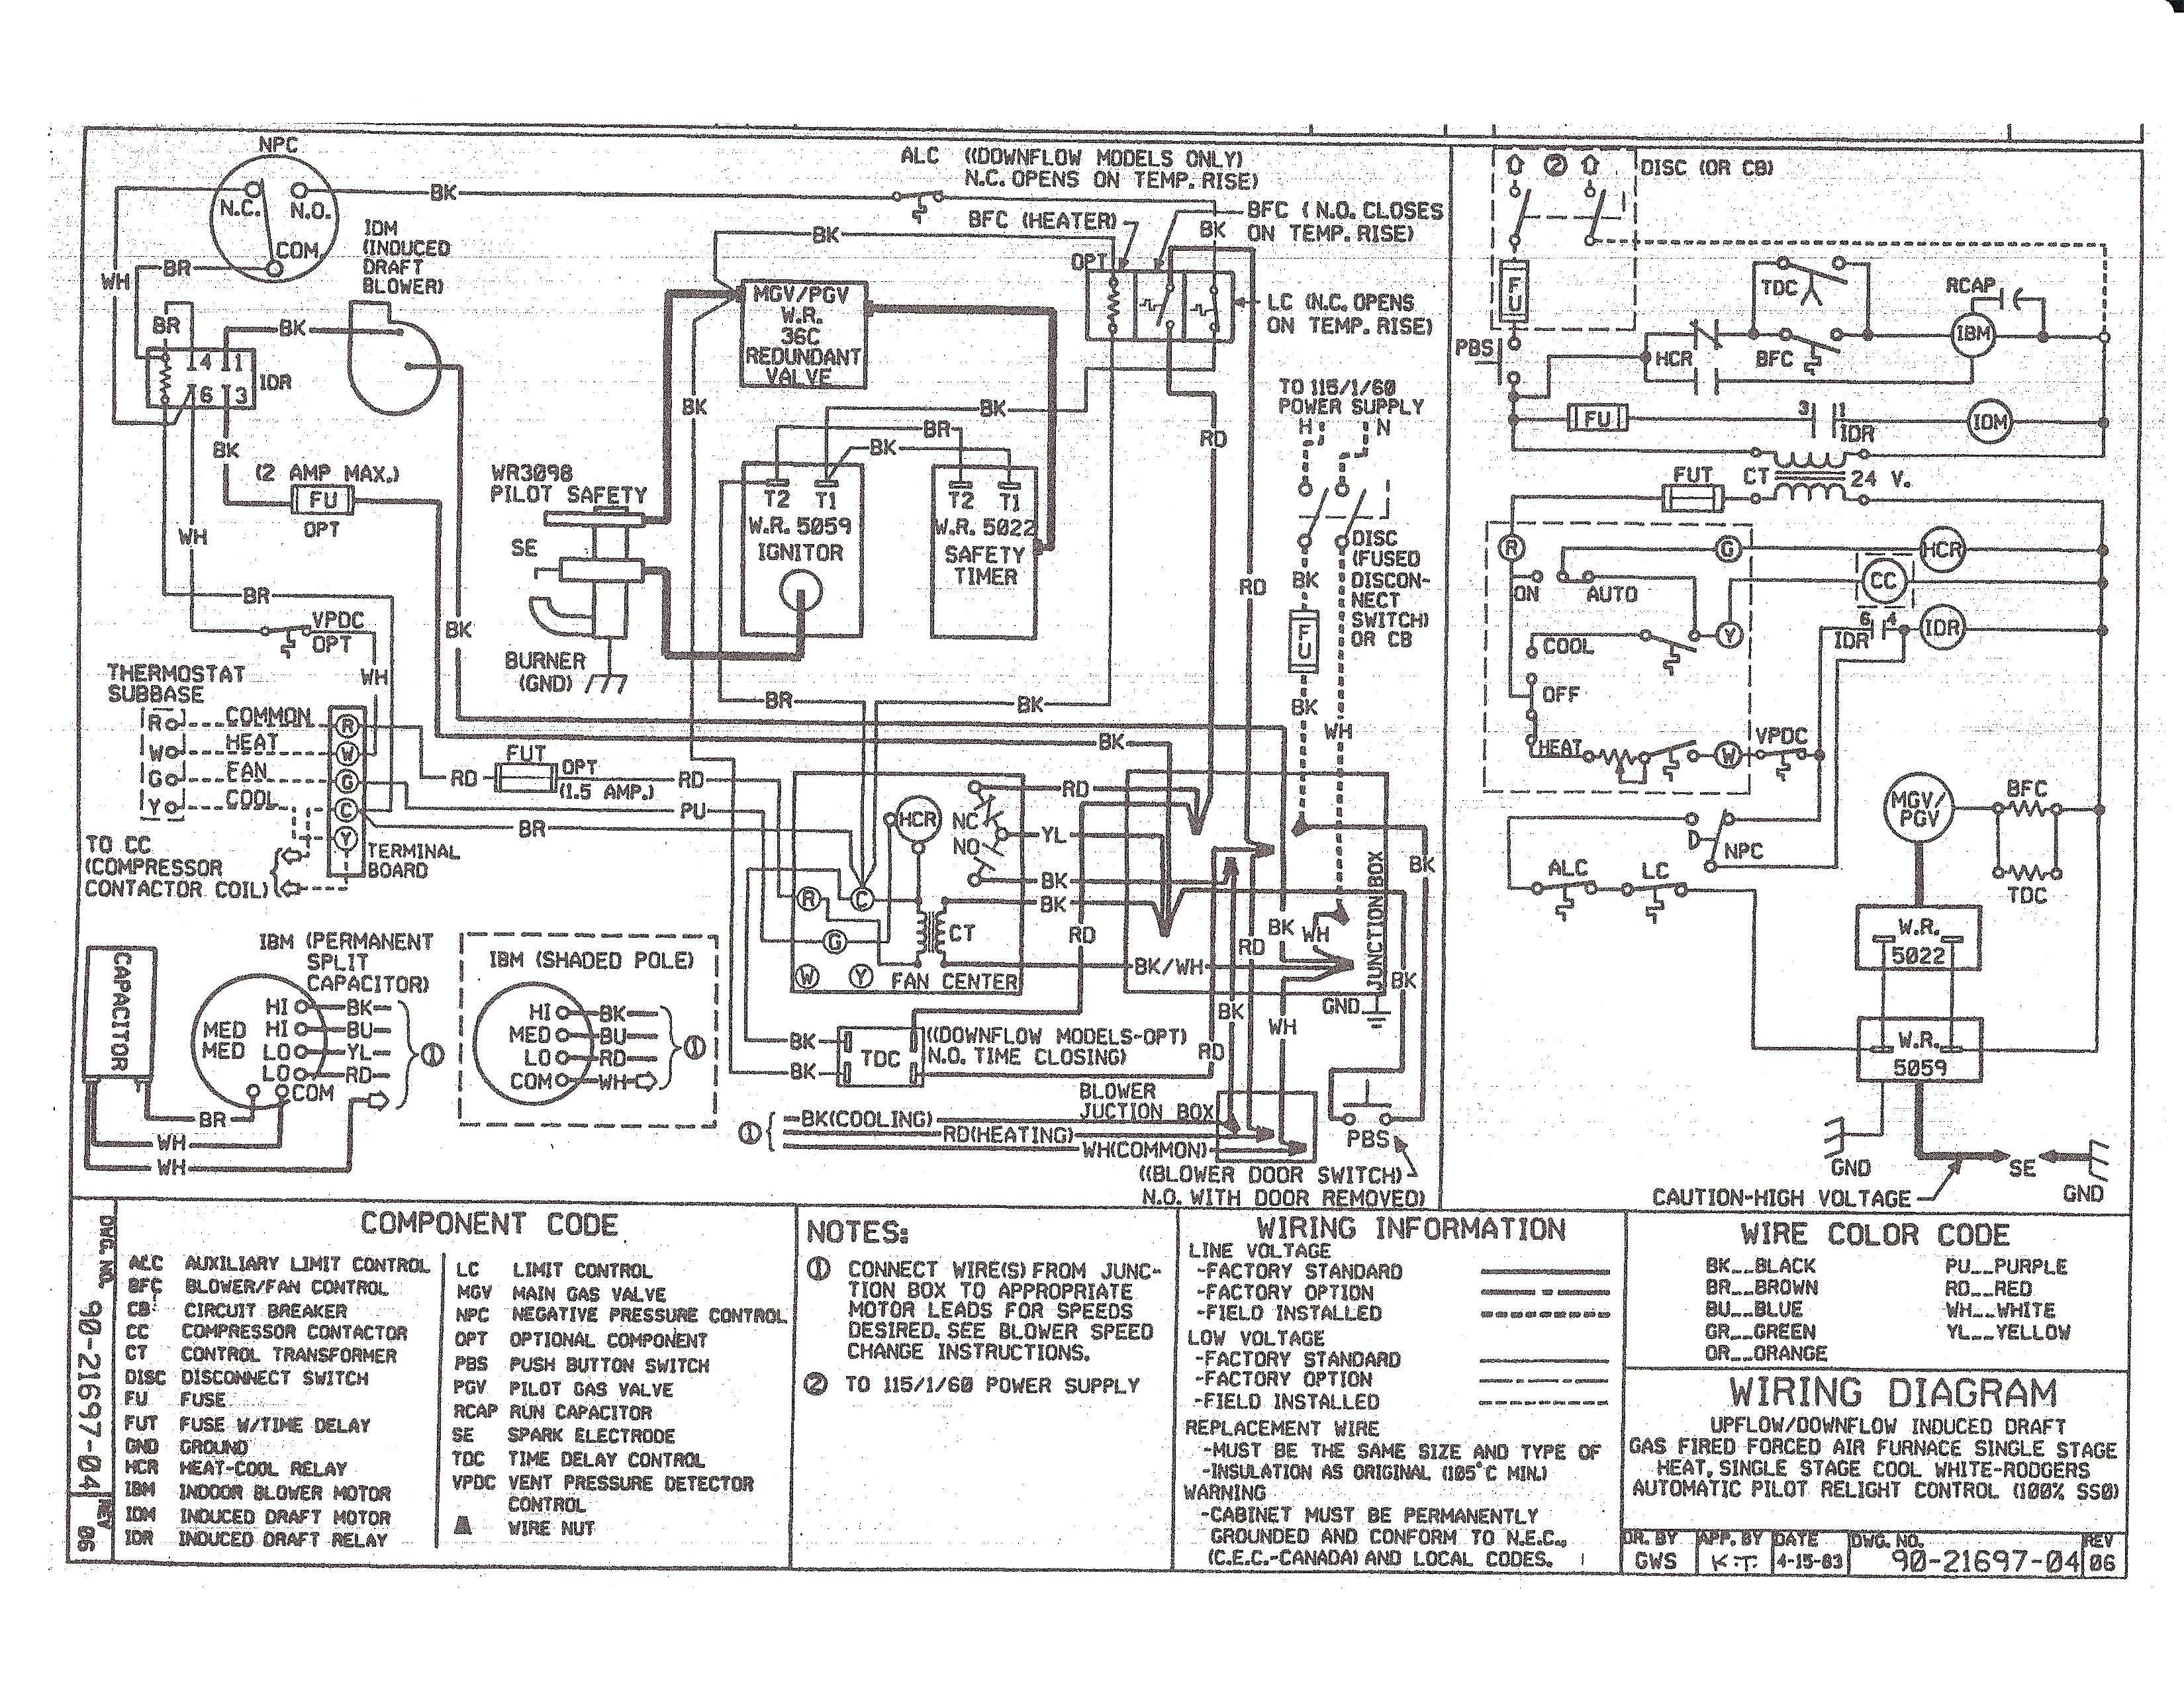 Coleman Furnace Wiring Diagram Gas Furnace Wiring Diagram Exquisite Shape Older Label Beauteous Of Coleman Furnace Wiring Diagram